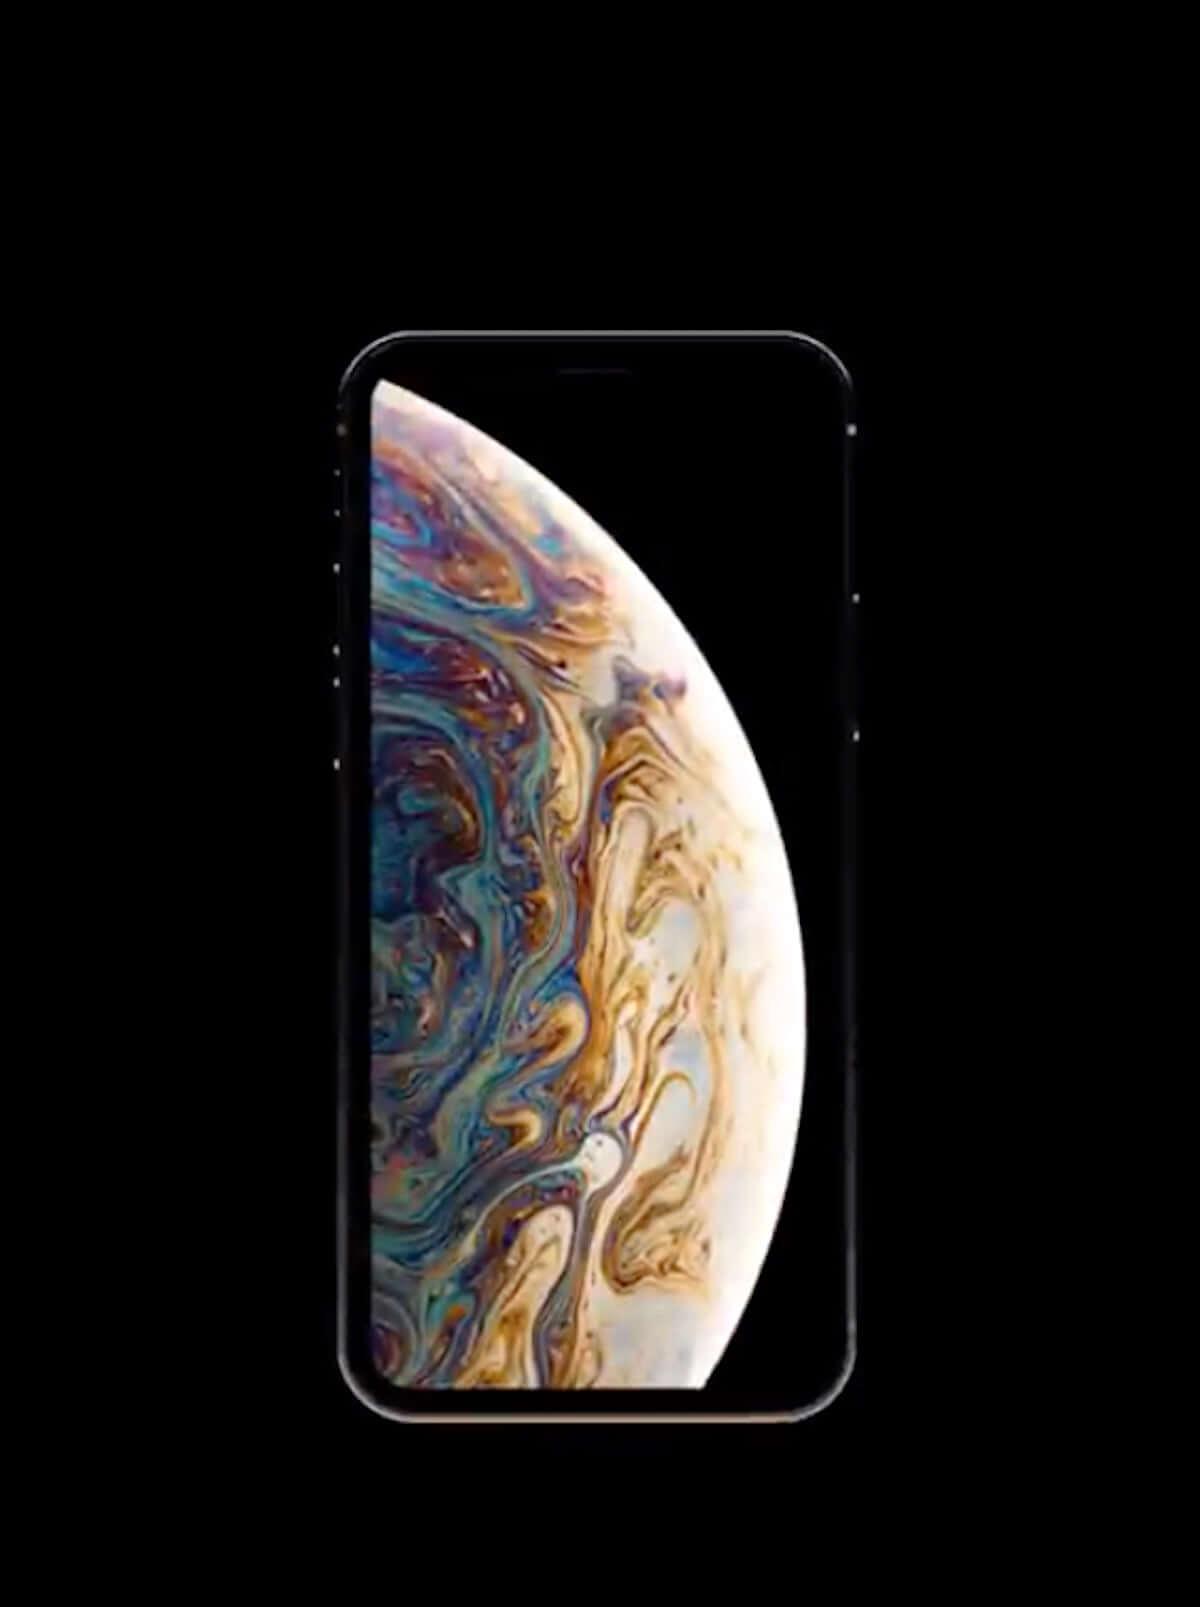 iPhone SE 2はこんな感じ?コンセプト動画が登場 190213_iphonese2_main-1200x1607